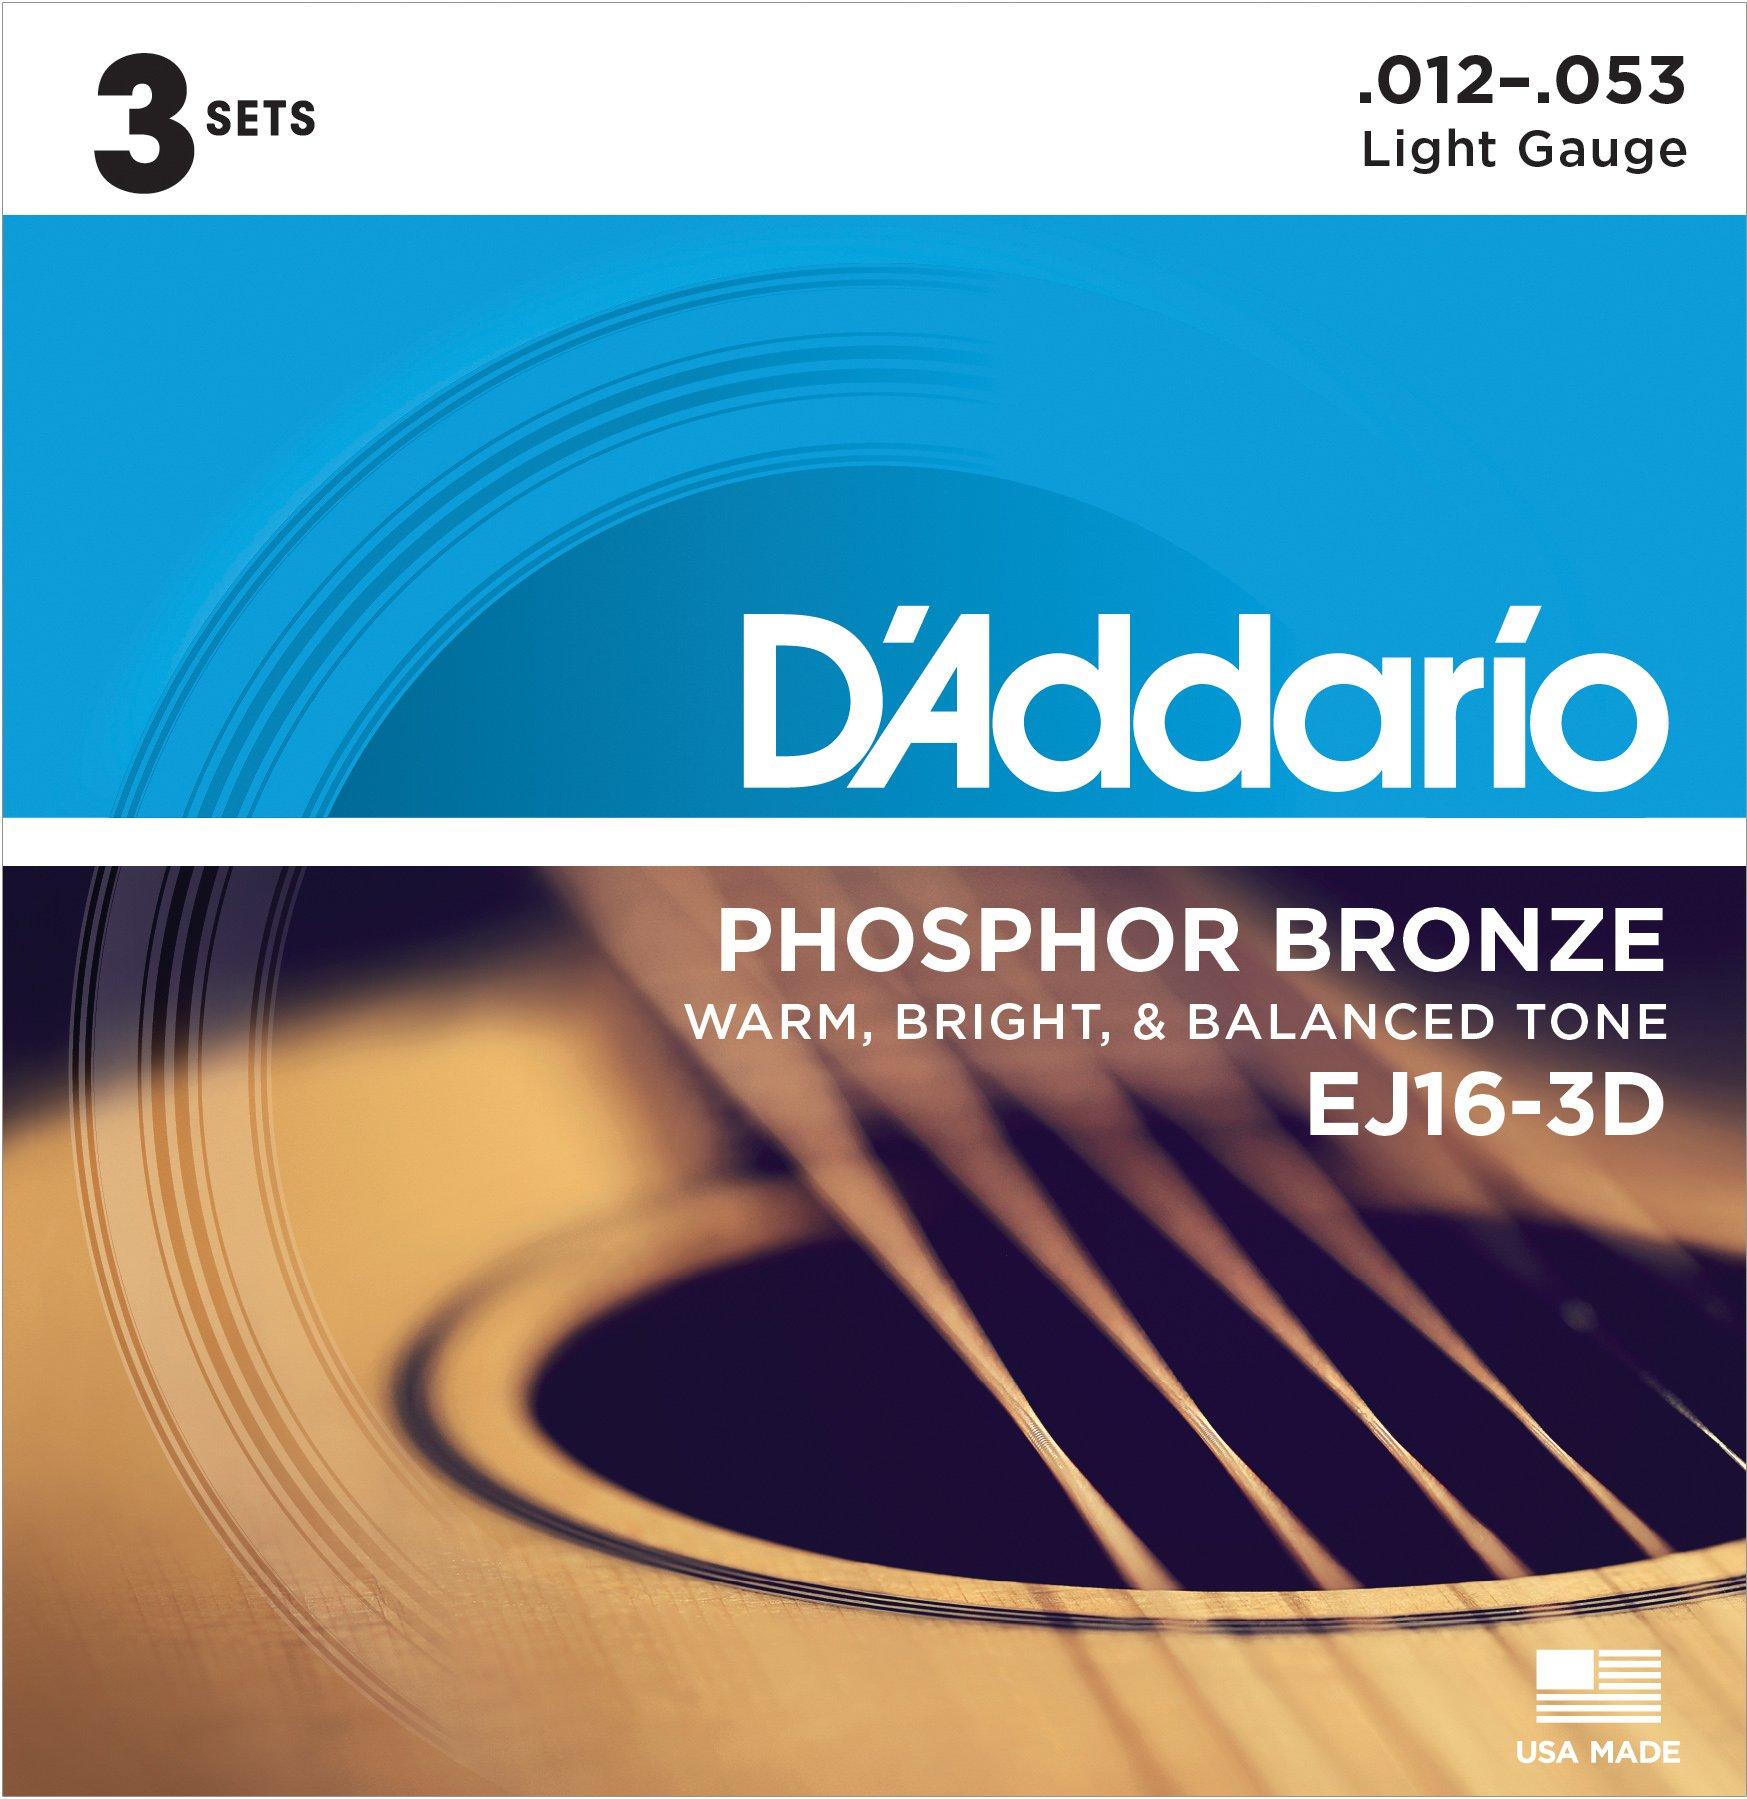 D'Addario EJ16-3D Phosphor Bronze Acoustic Guitar Strings, Light, Pack of 3 product image